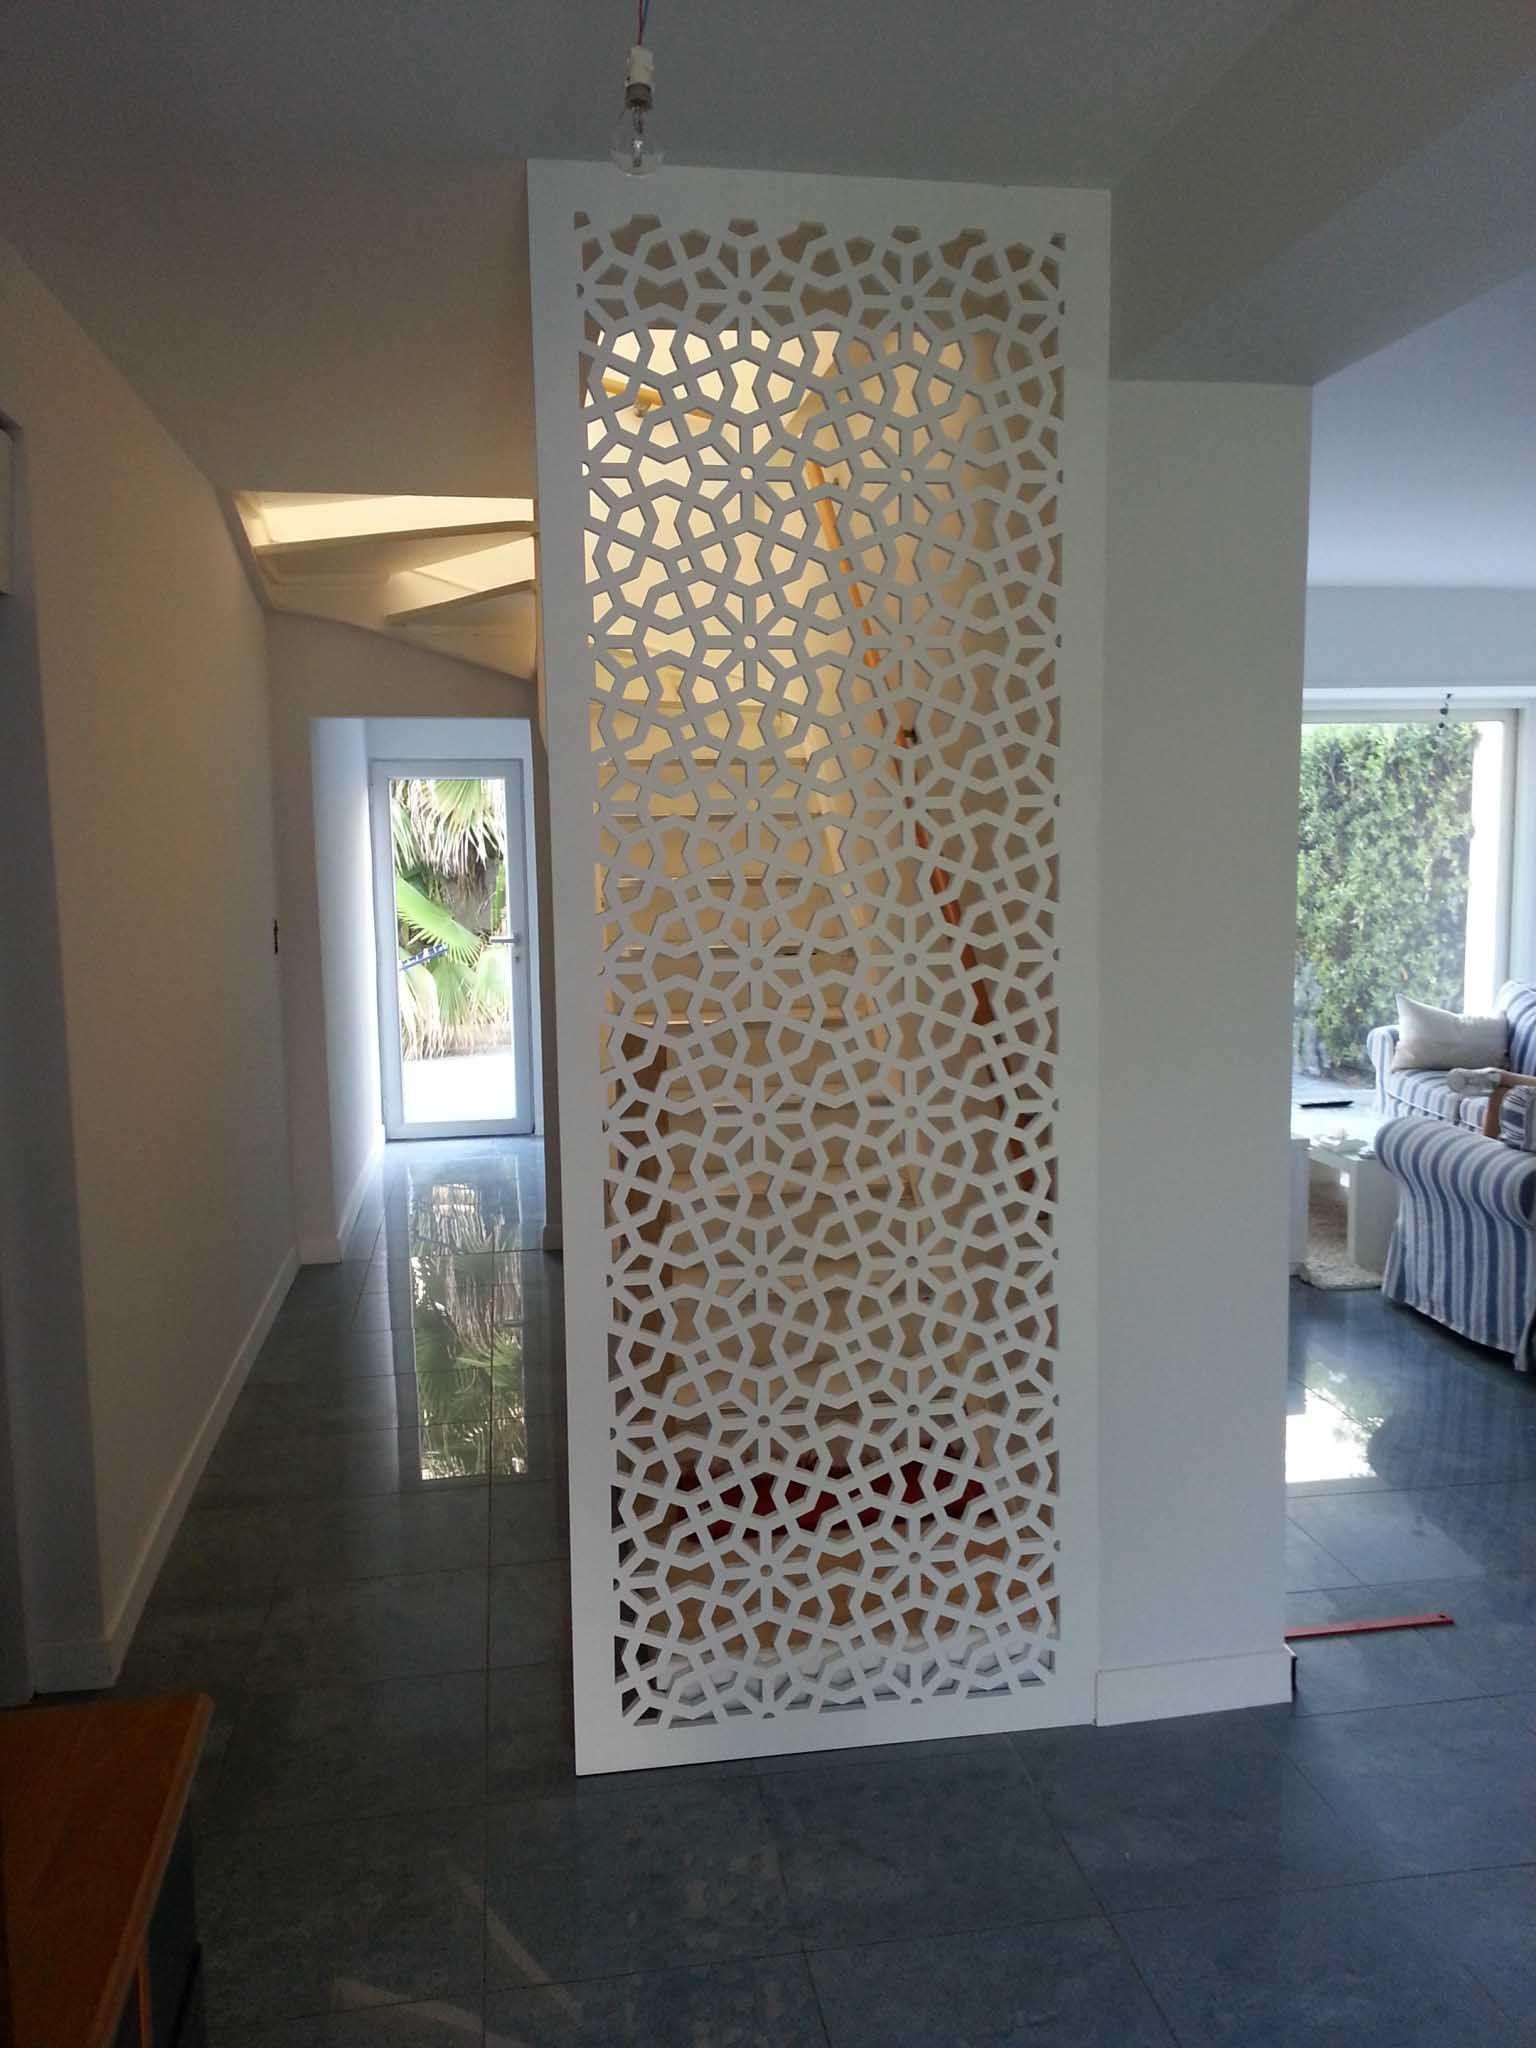 claustra orion pinterest divider salons and mezzanine. Black Bedroom Furniture Sets. Home Design Ideas